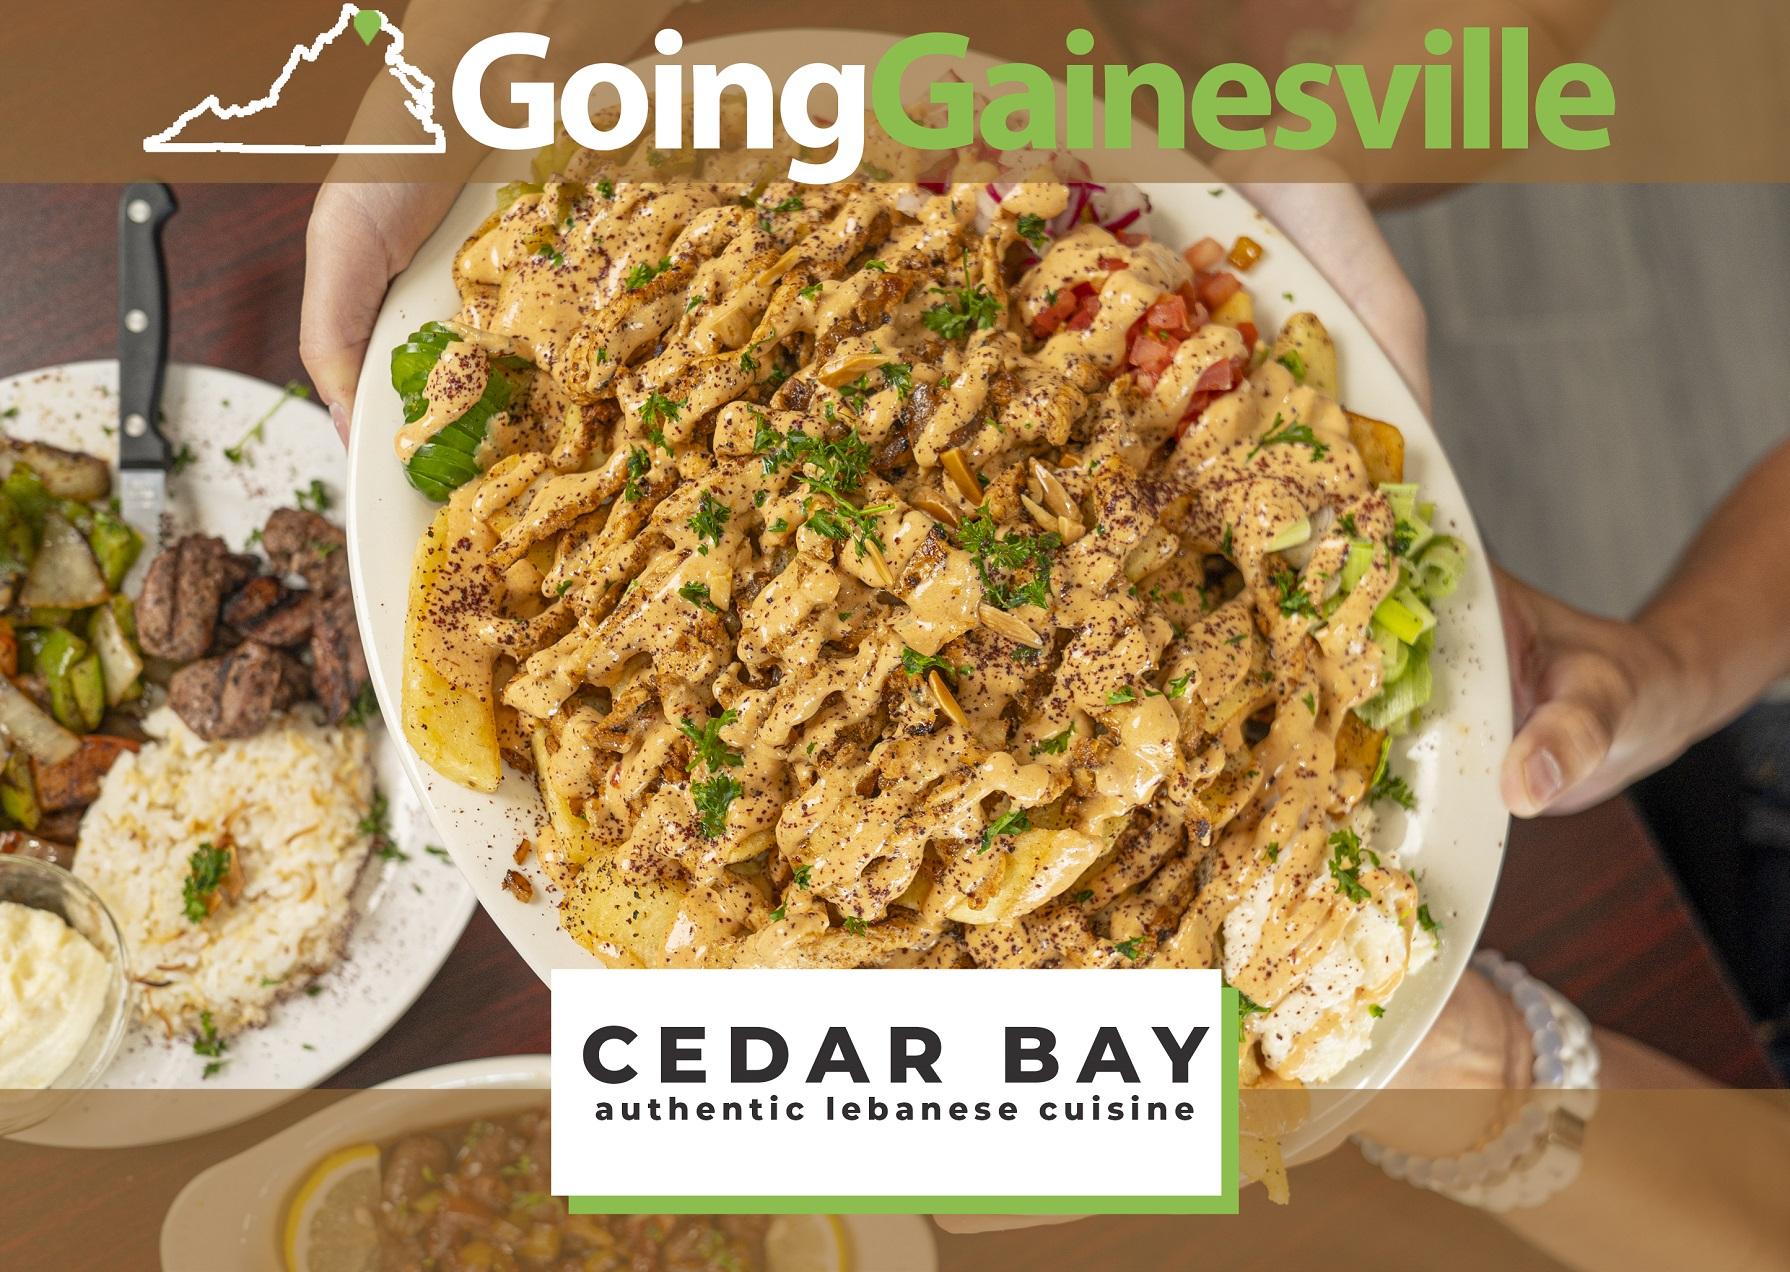 Cedar Bay Authentic Lebanese Cuisine